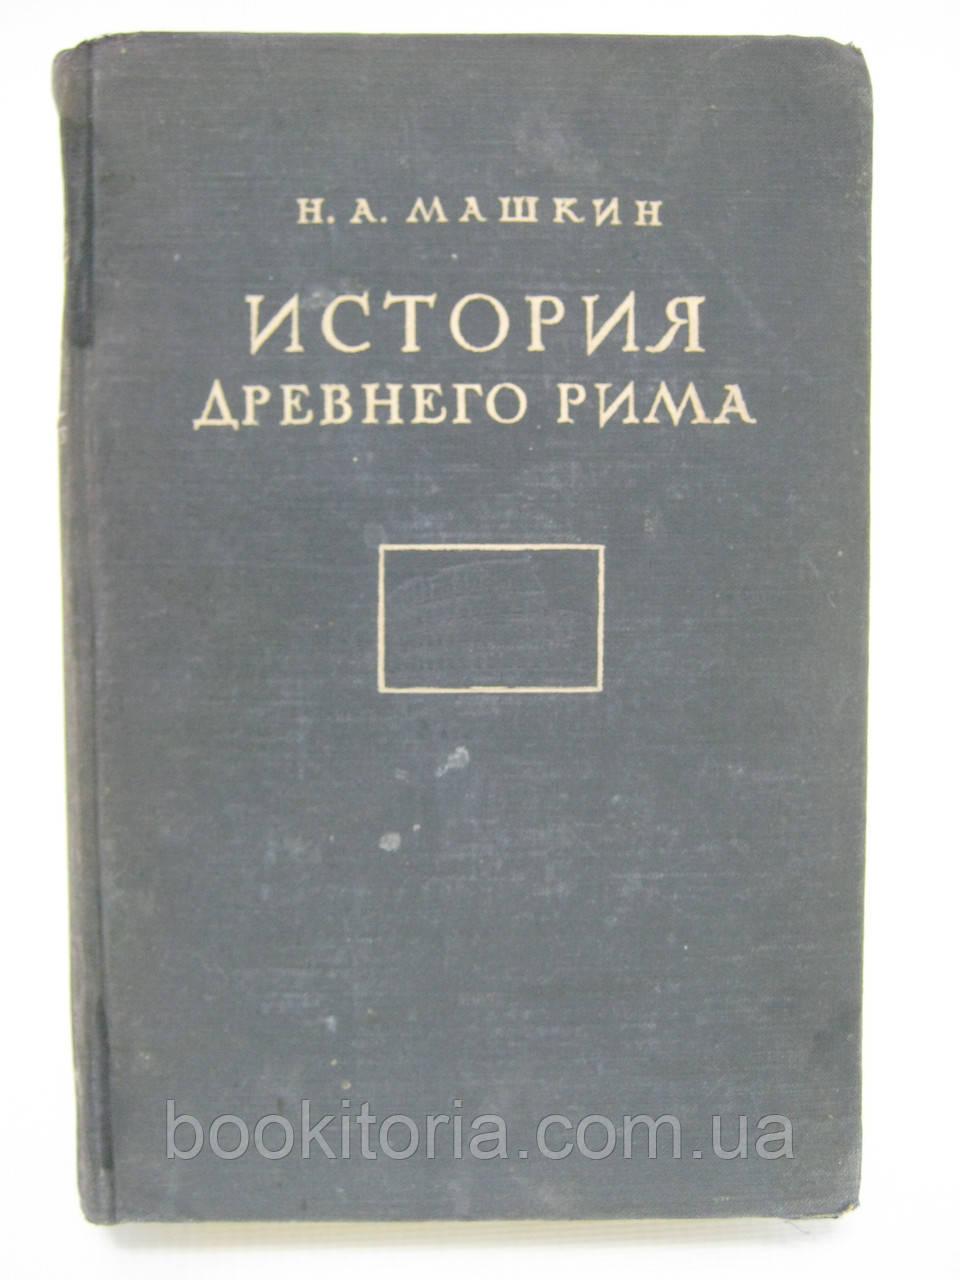 Машкин Н.А. История Древнего Рима (б/у).